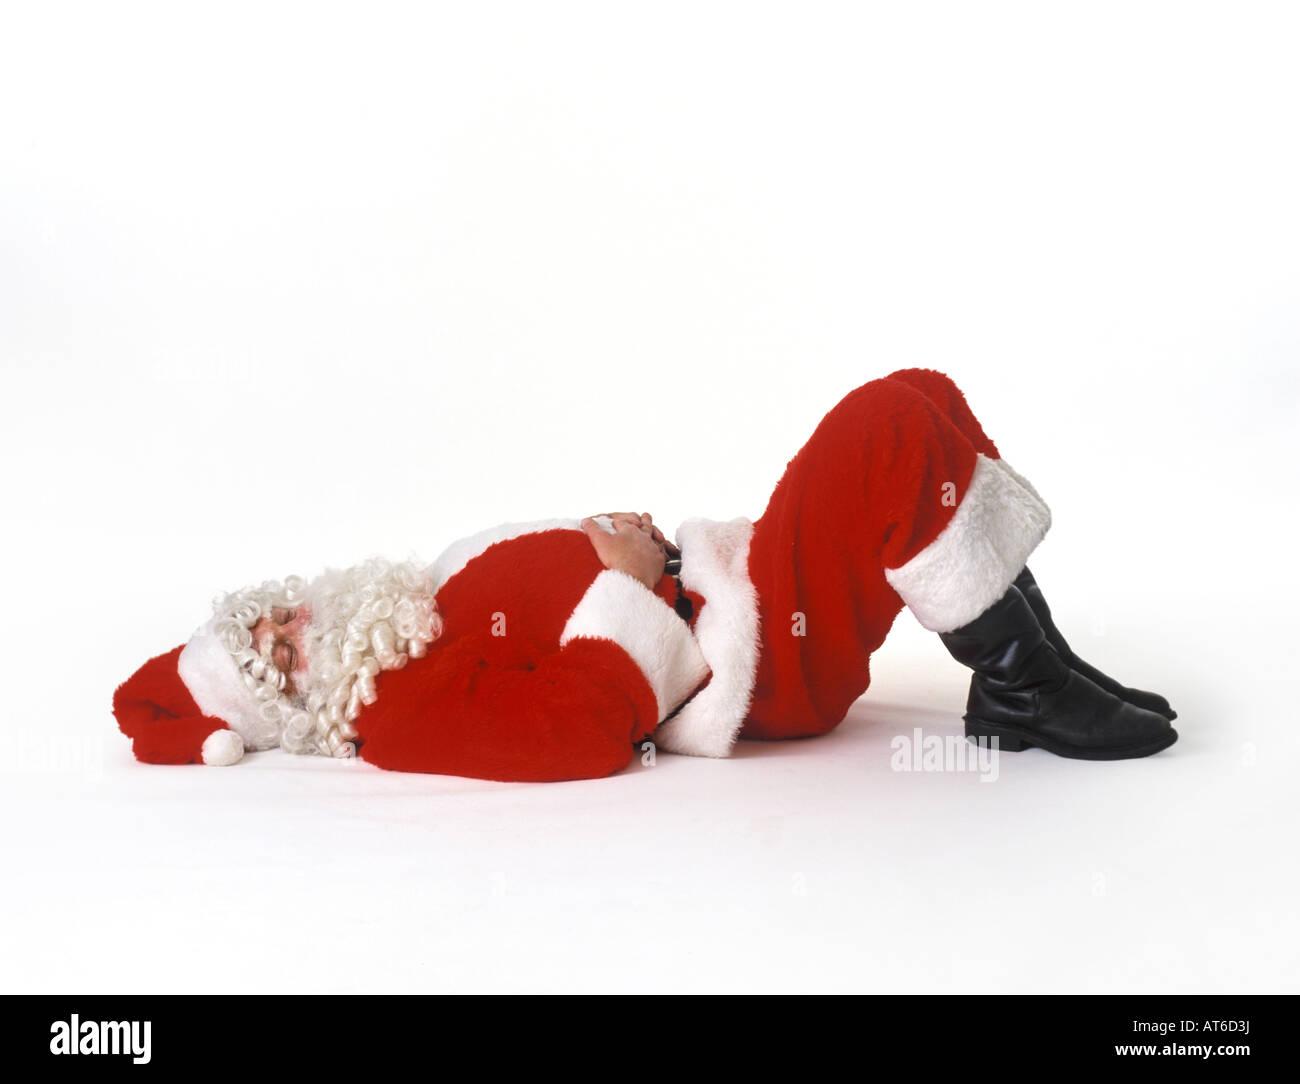 Sleeping Santa Claus on white background - Stock Image